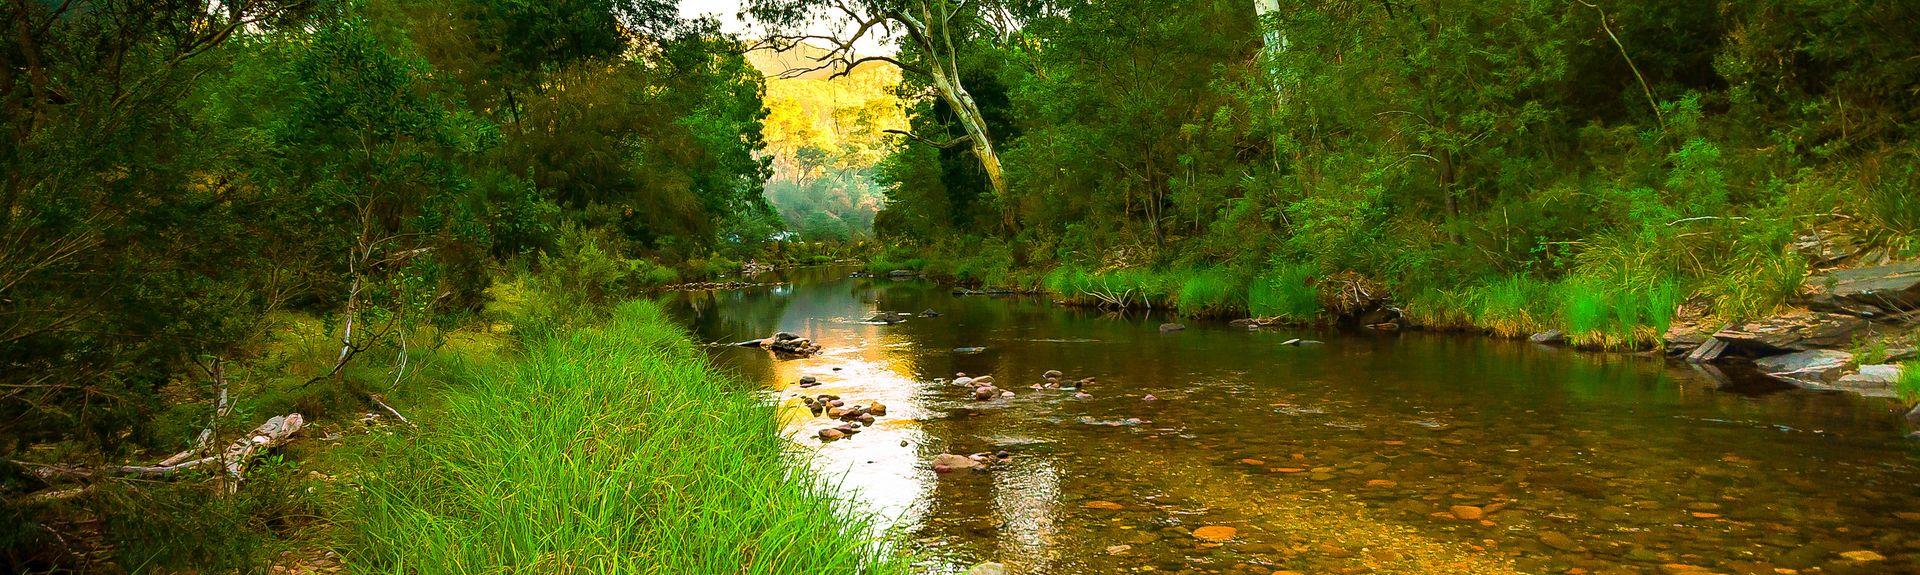 Jamieson, Victoria, Australia